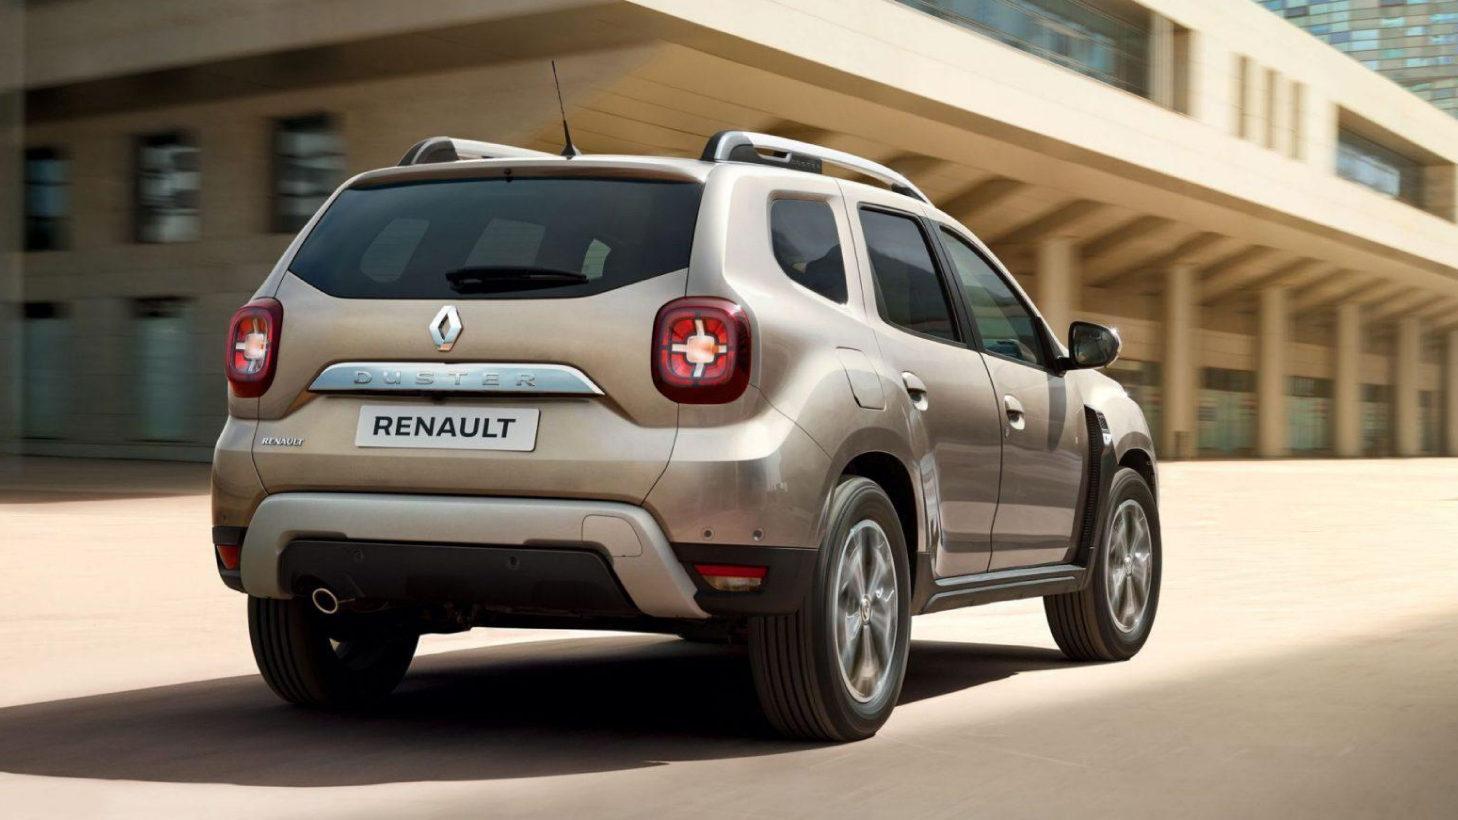 Запорожский завод ЗАЗ объявил о запуске производства автомобилей под брендом Renault